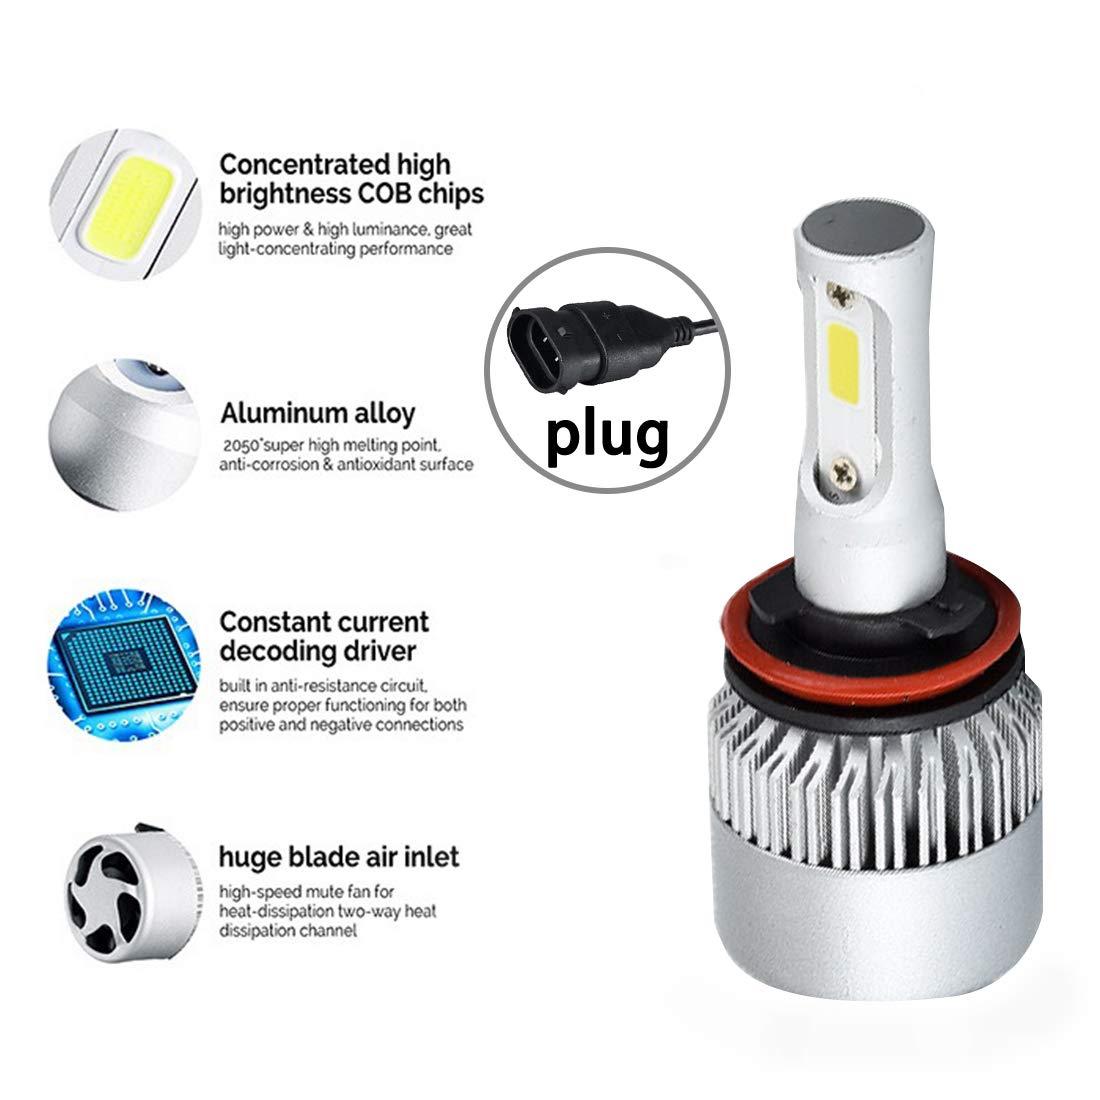 H11 LED Headlight Bulbs Headlamp Bulbs COB Chip 72W 8000 Lumens 6500K Car Headlight Conversion Kit Low Beam Headlamp H9 H8 Xenon White Extremely Bright Fog Driving Light 2 Years Warranty 2 Pack